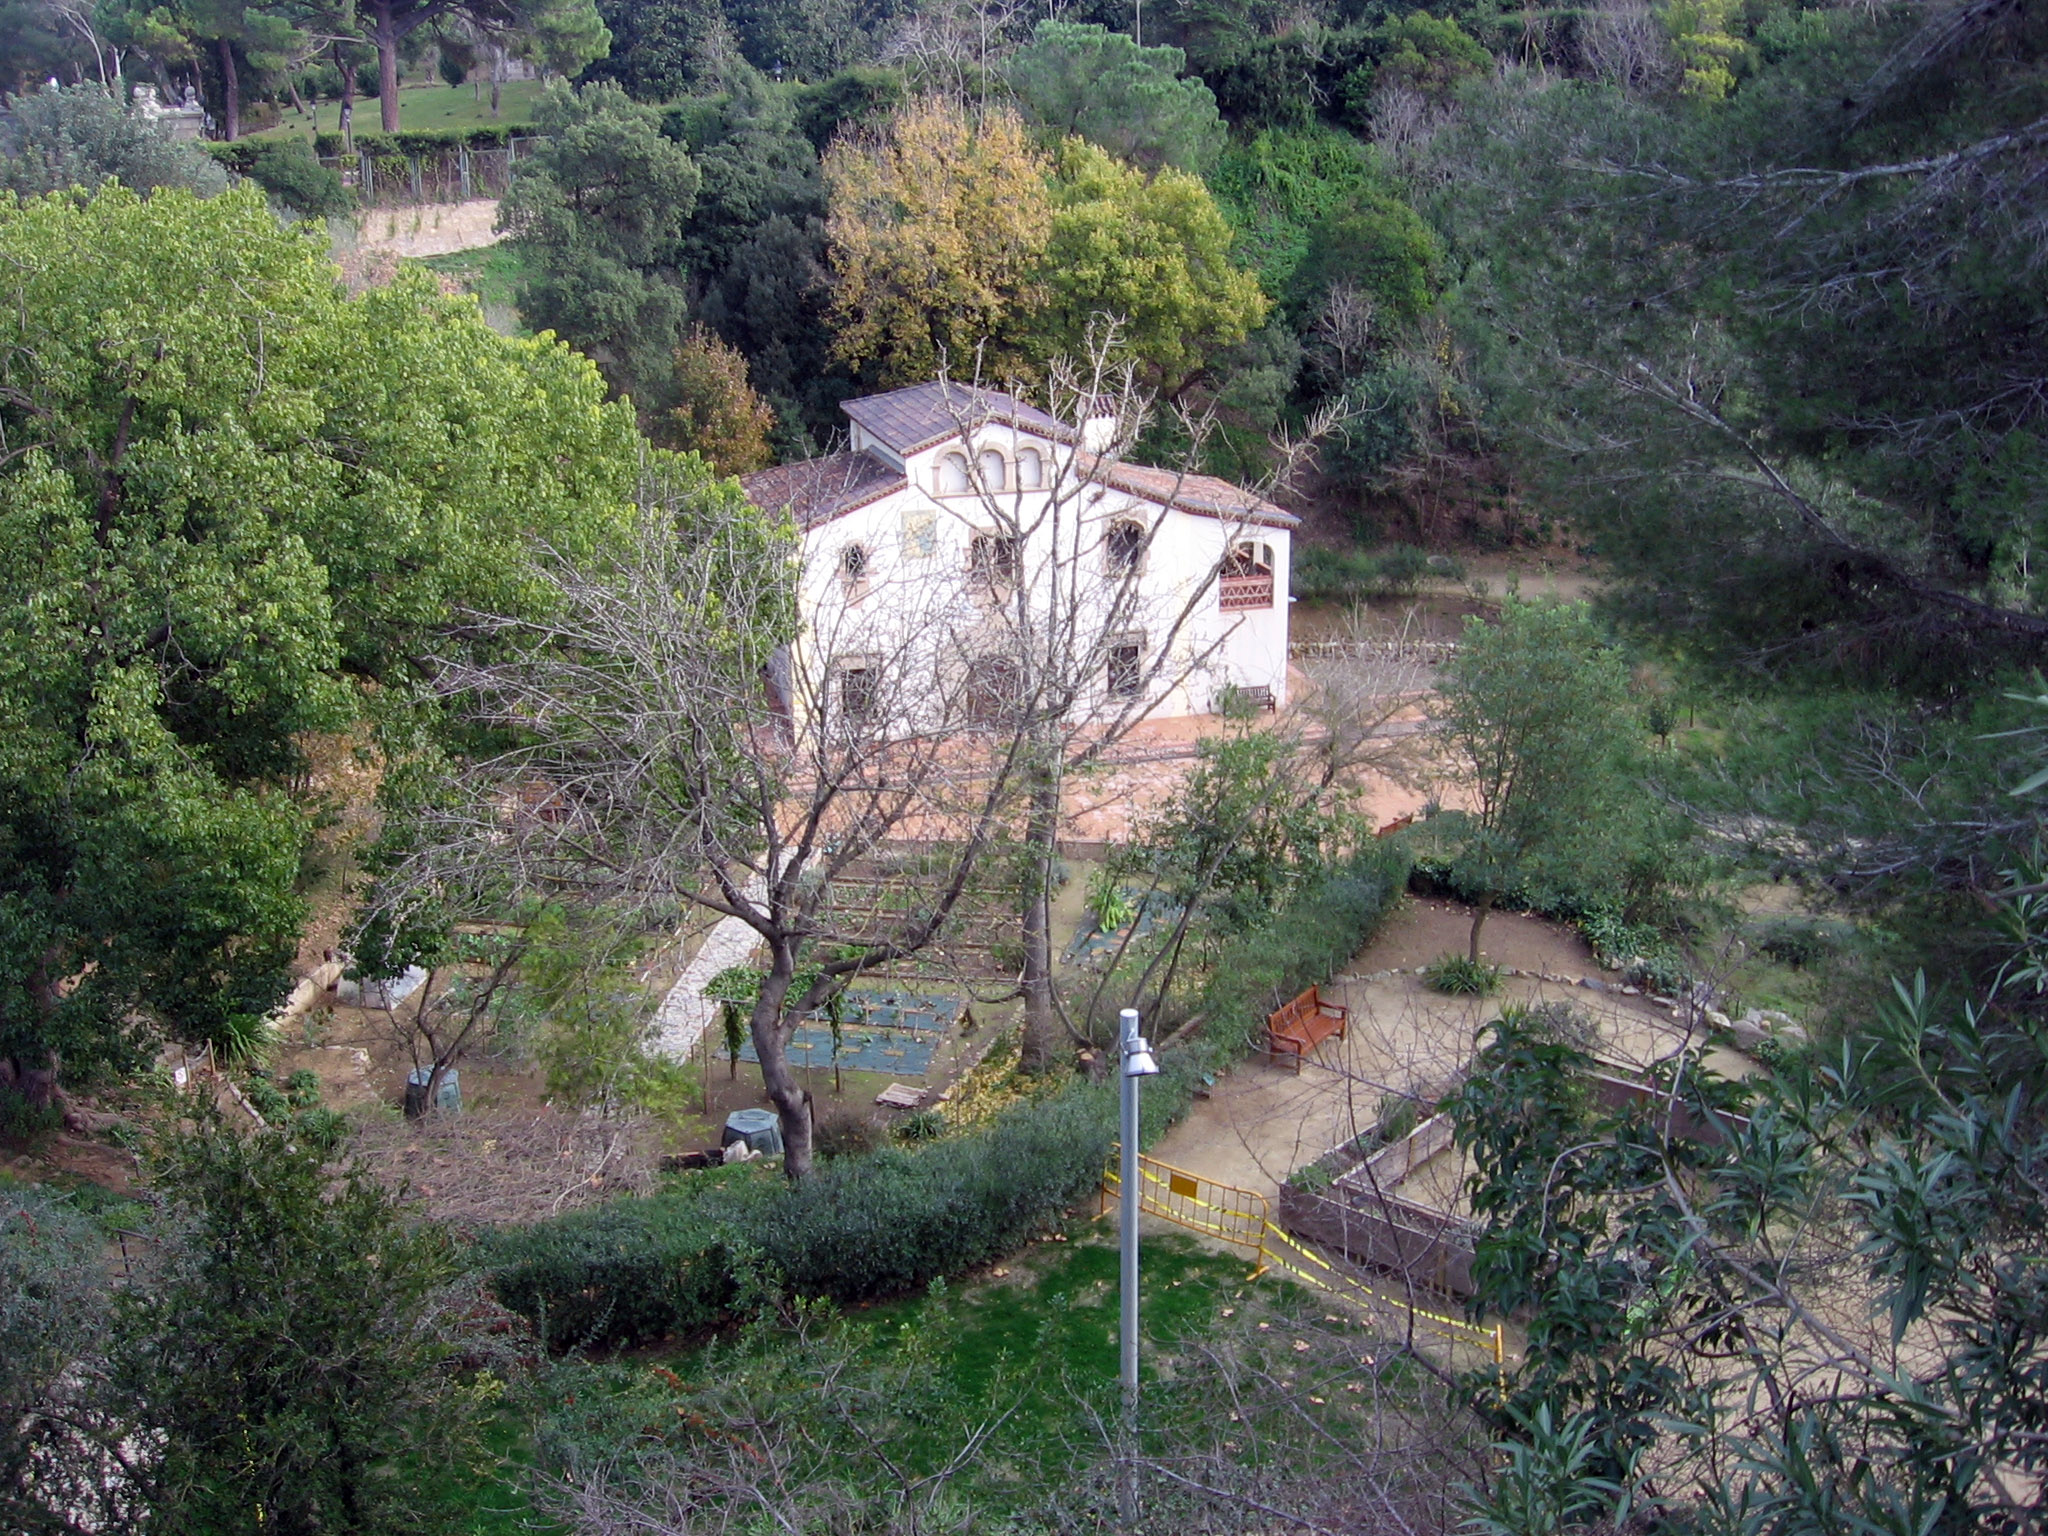 Jard n bot nico hist rico de barcelona wikiwand for Barcelona jardin botanico